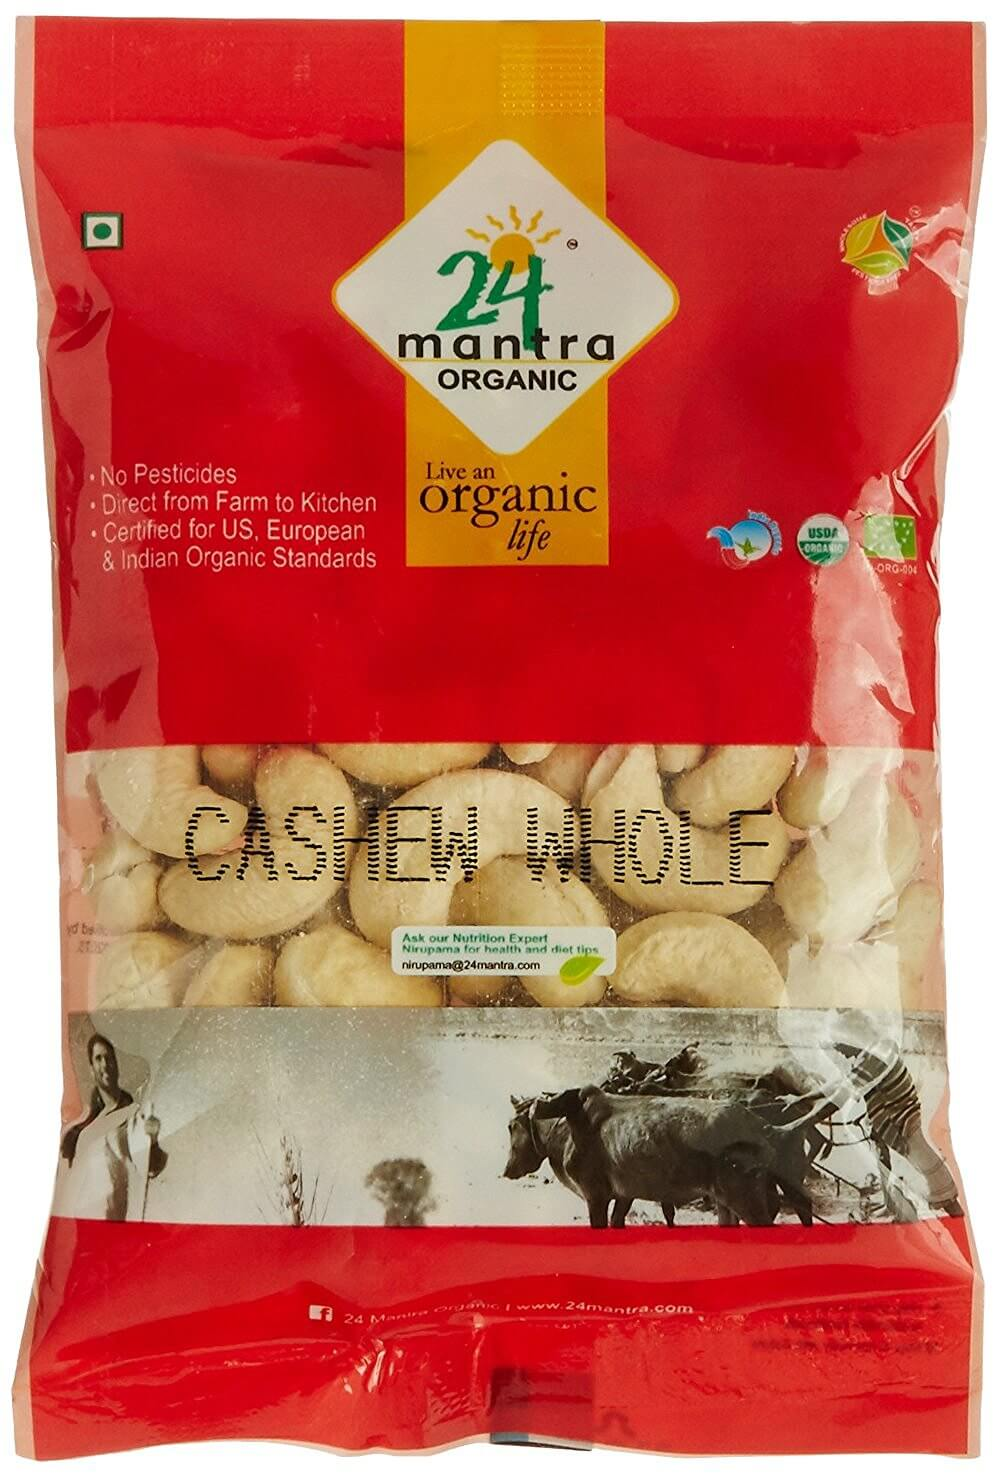 24 Mantra Organic Cashew Whole 100g VizagShop.com